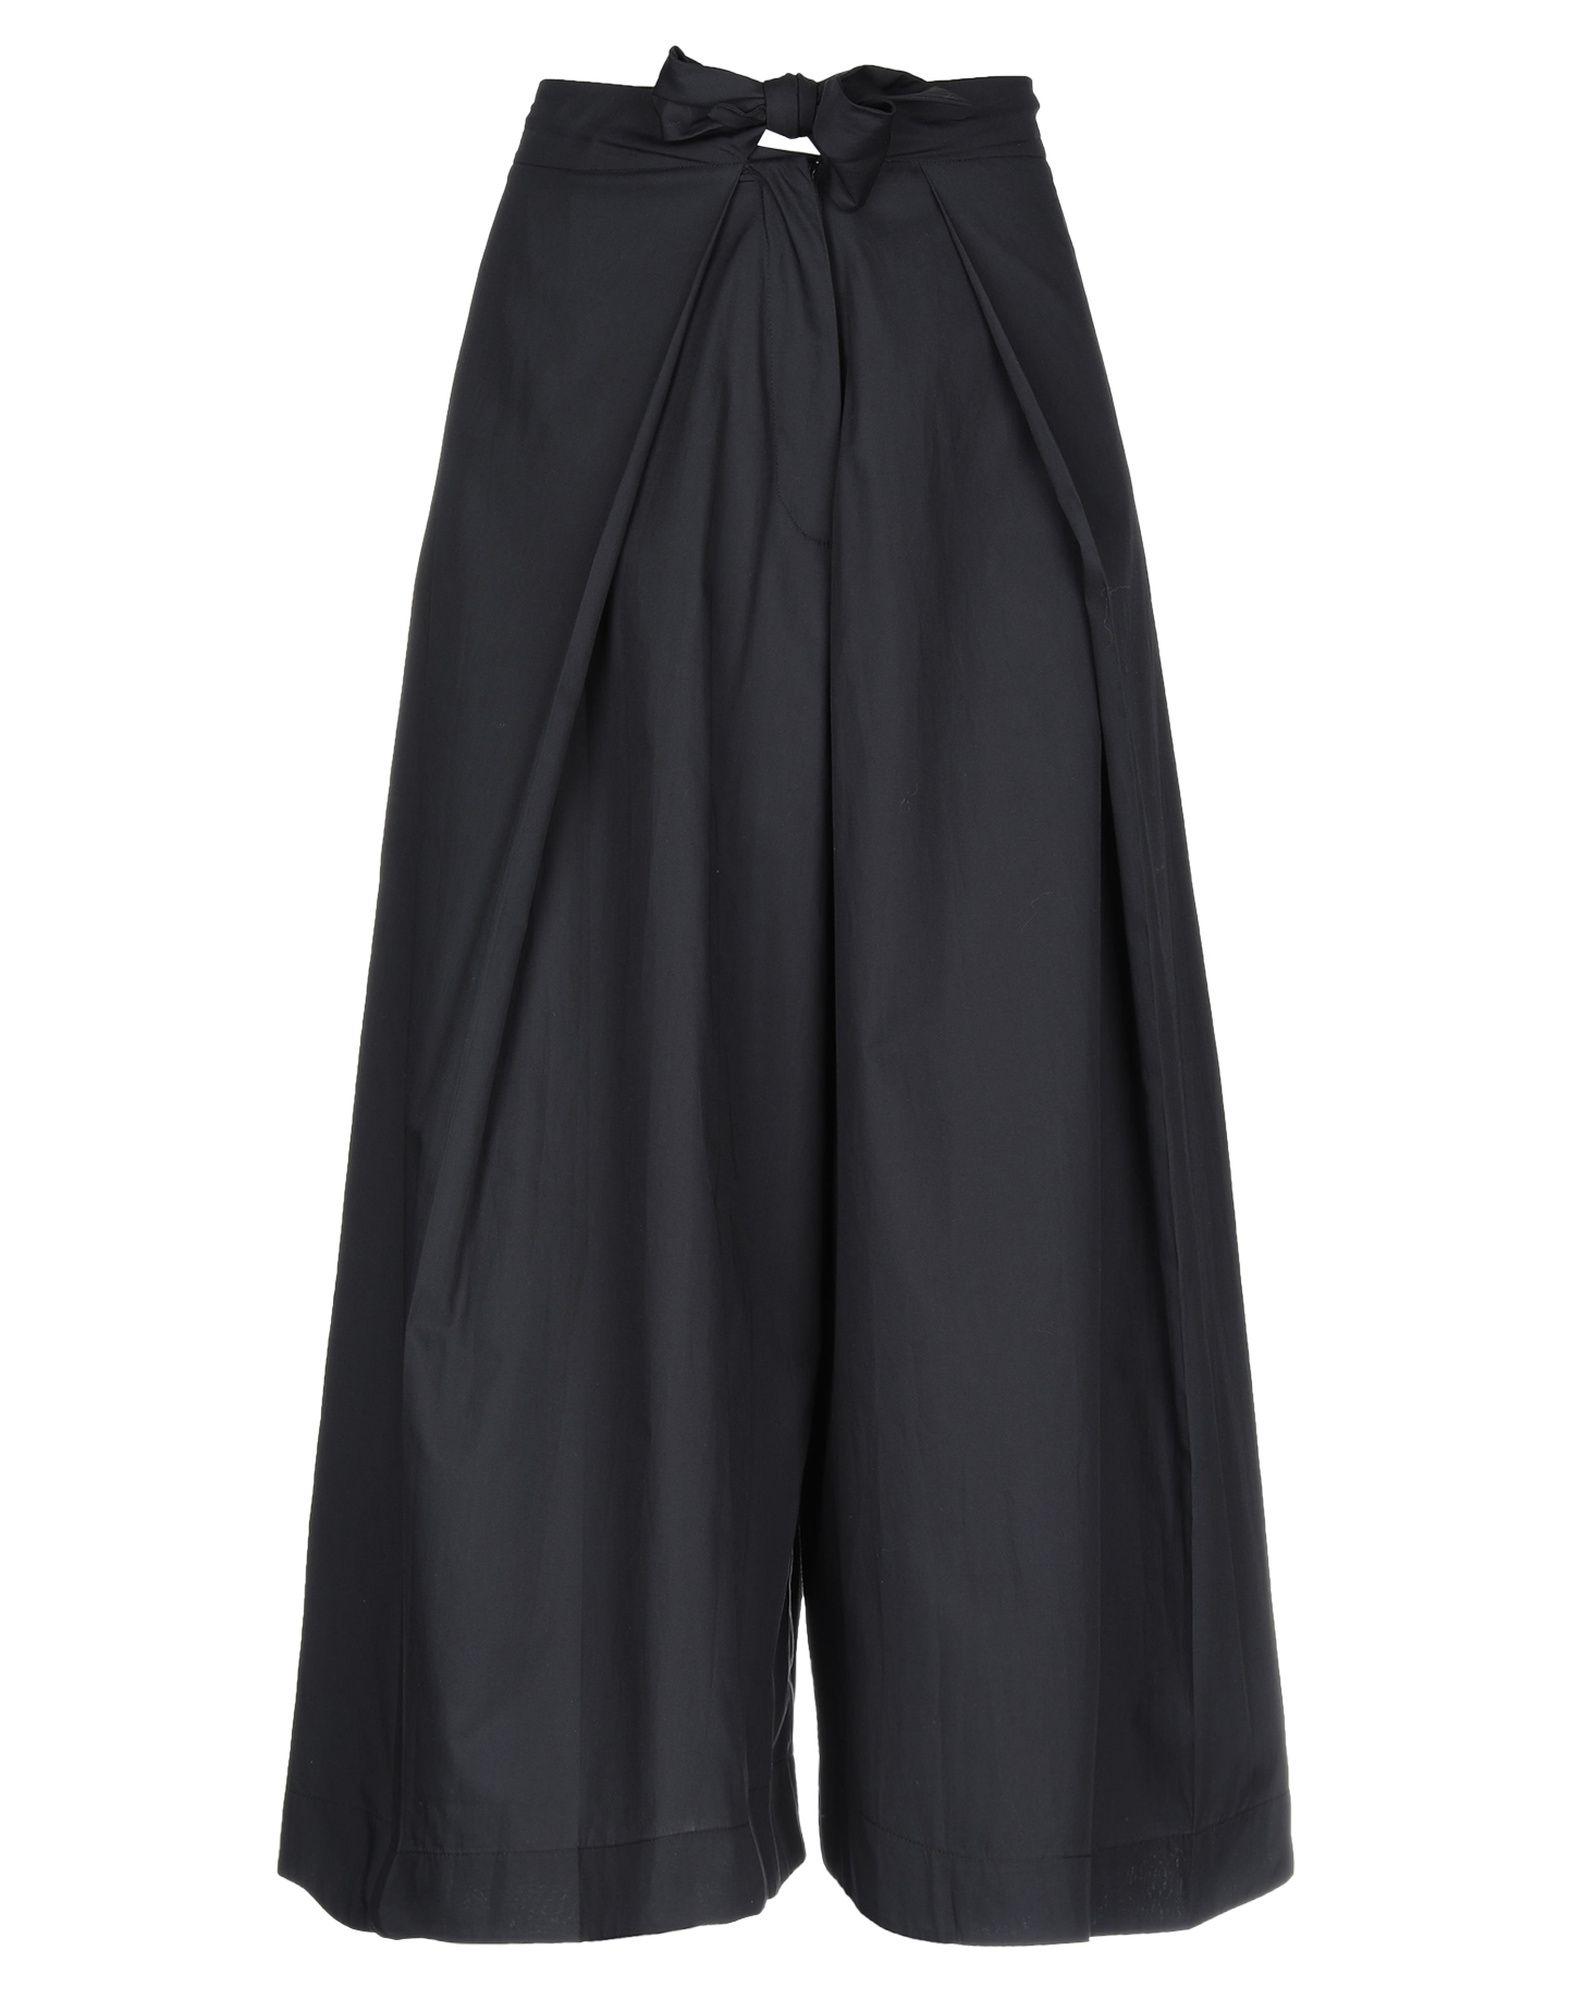 ROBERTA FURLANETTO Юбка длиной 3/4 moschino couture юбка длиной 3 4